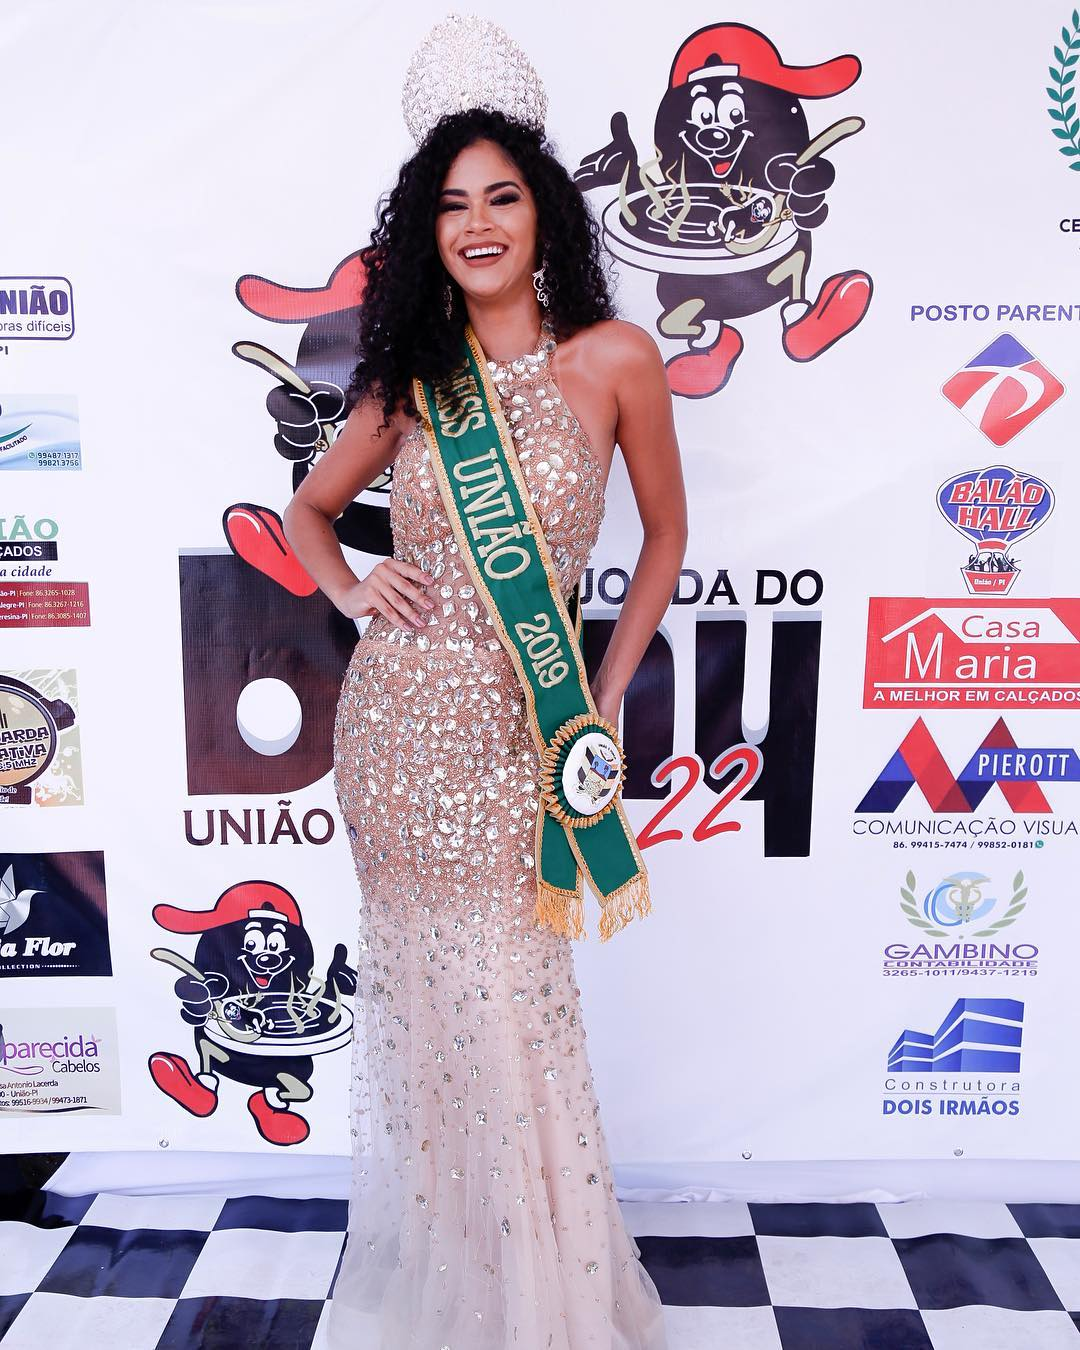 roberlania viana, candidata ao miss piaui 2019. 42320410